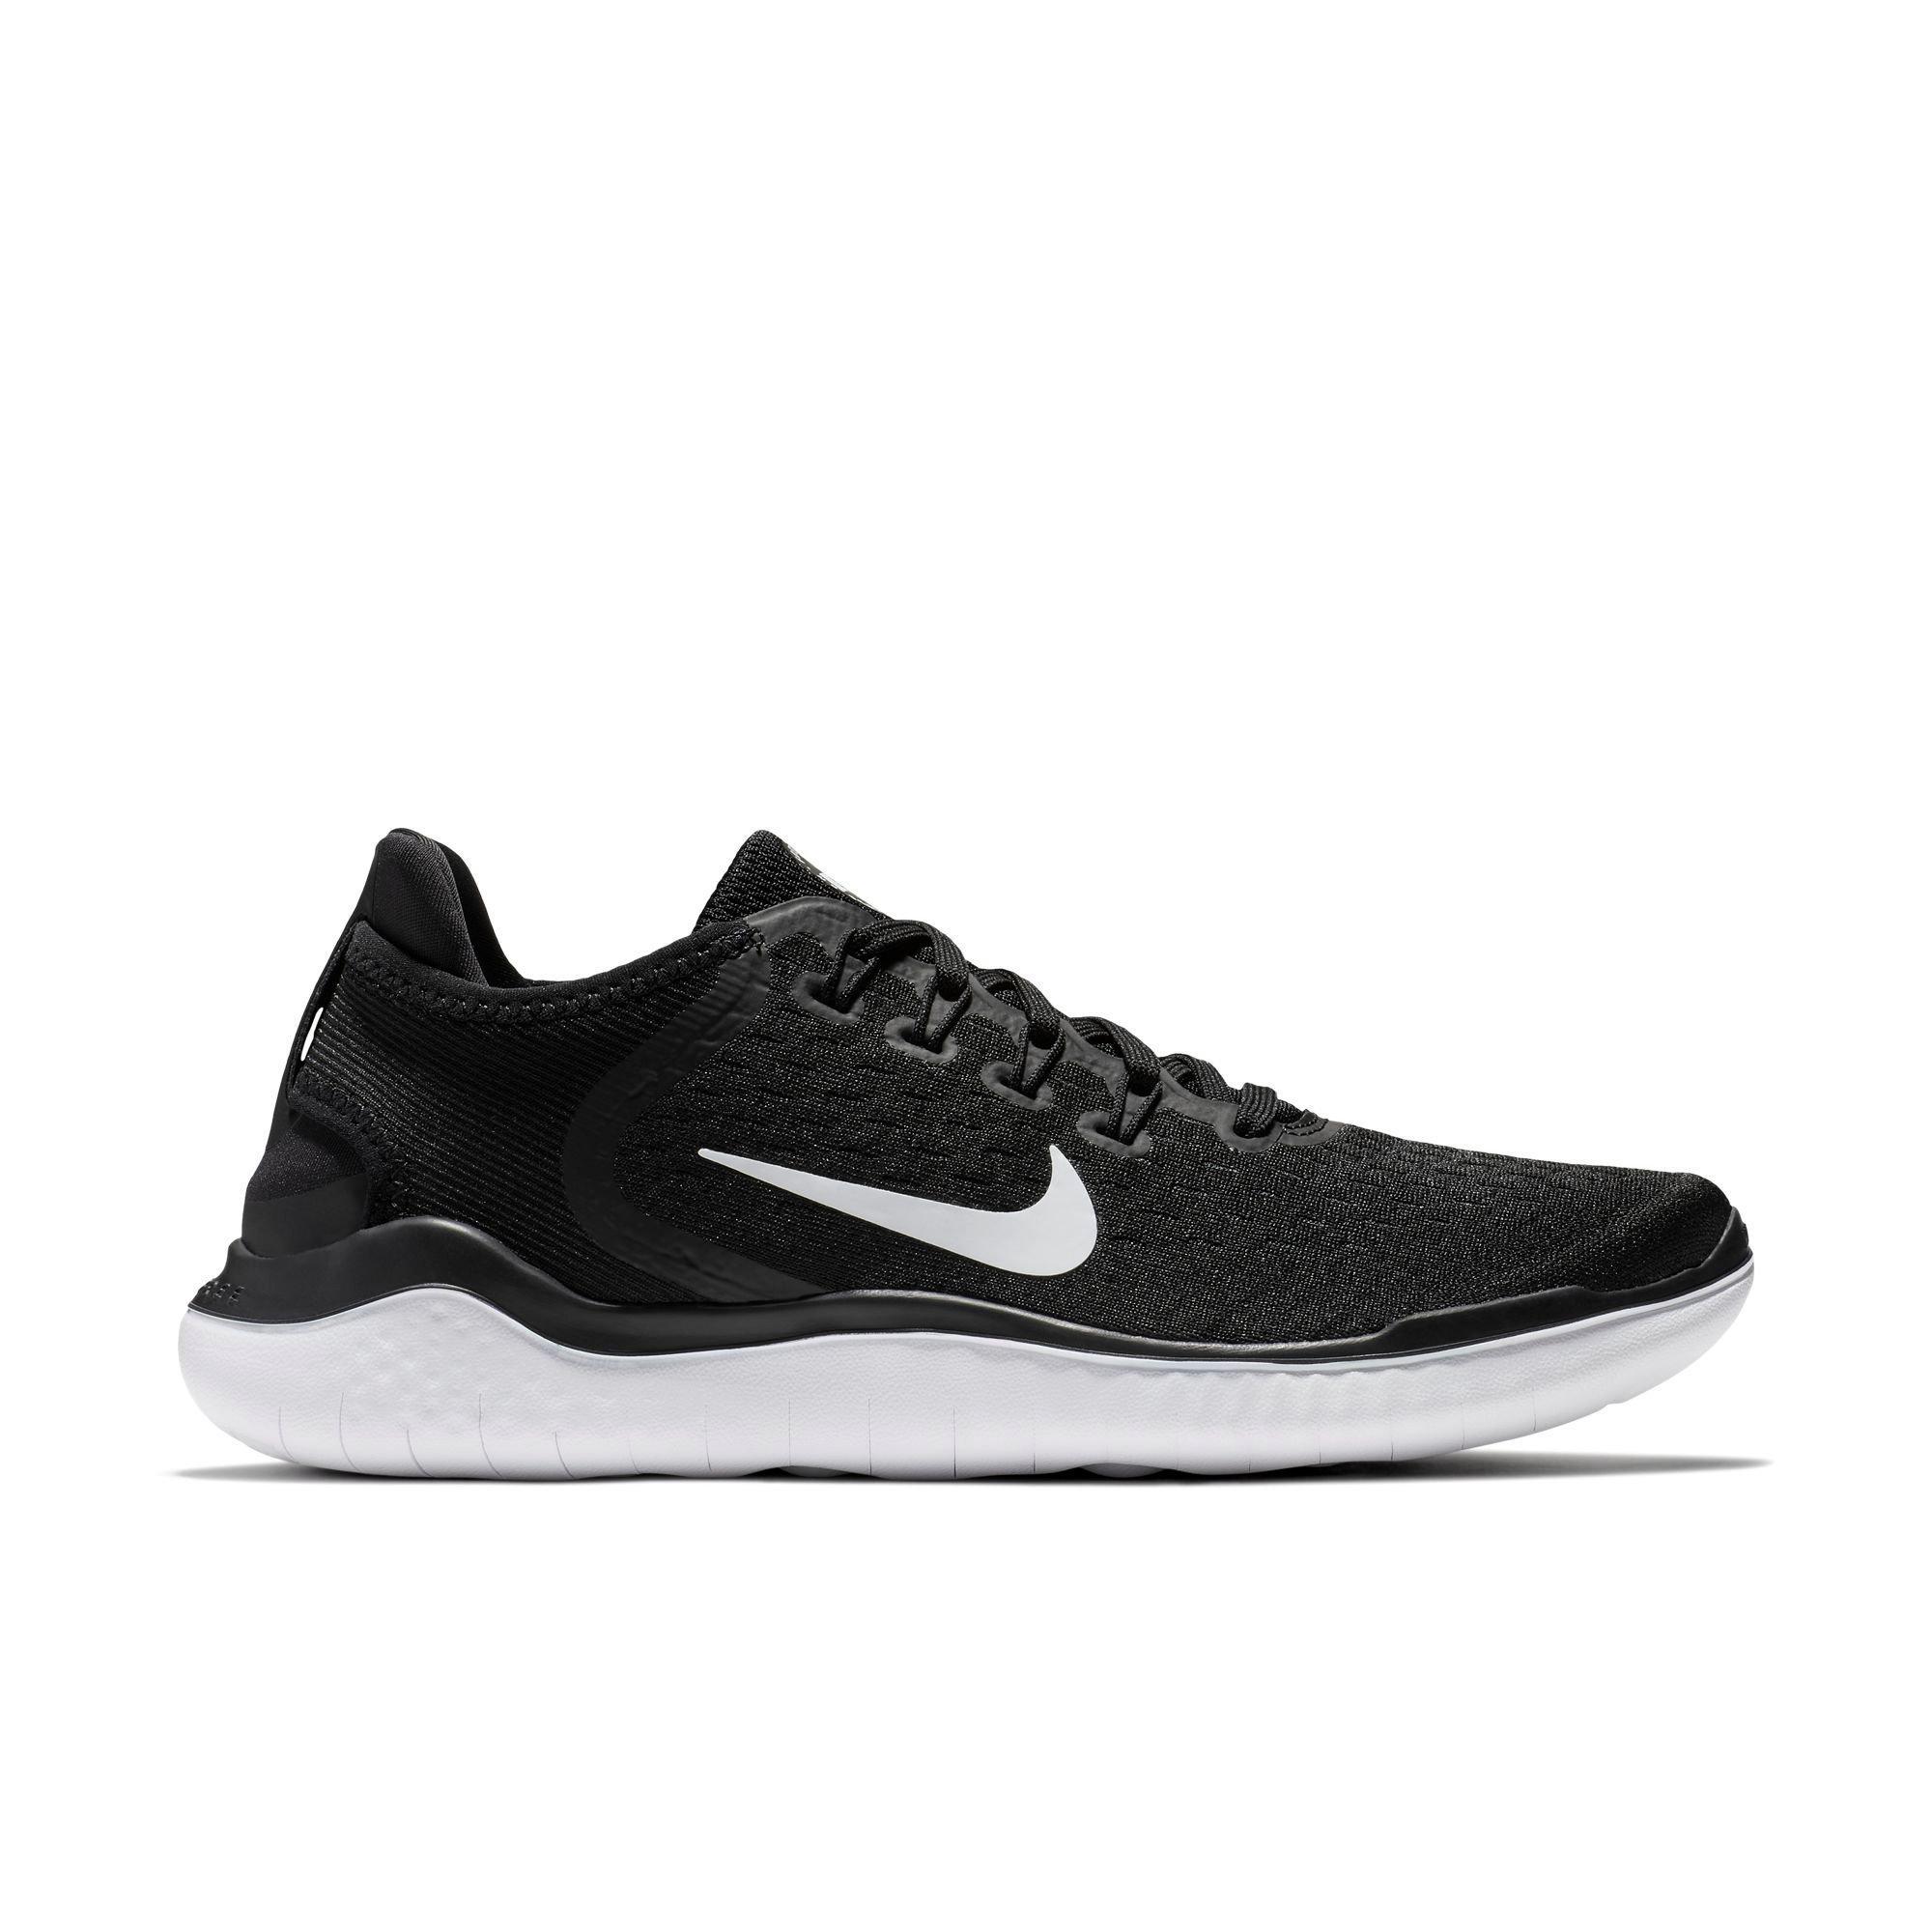 Nike Free RN Viajero 2017 Premium Hombre Zapatillas Running 1hO1DLZR